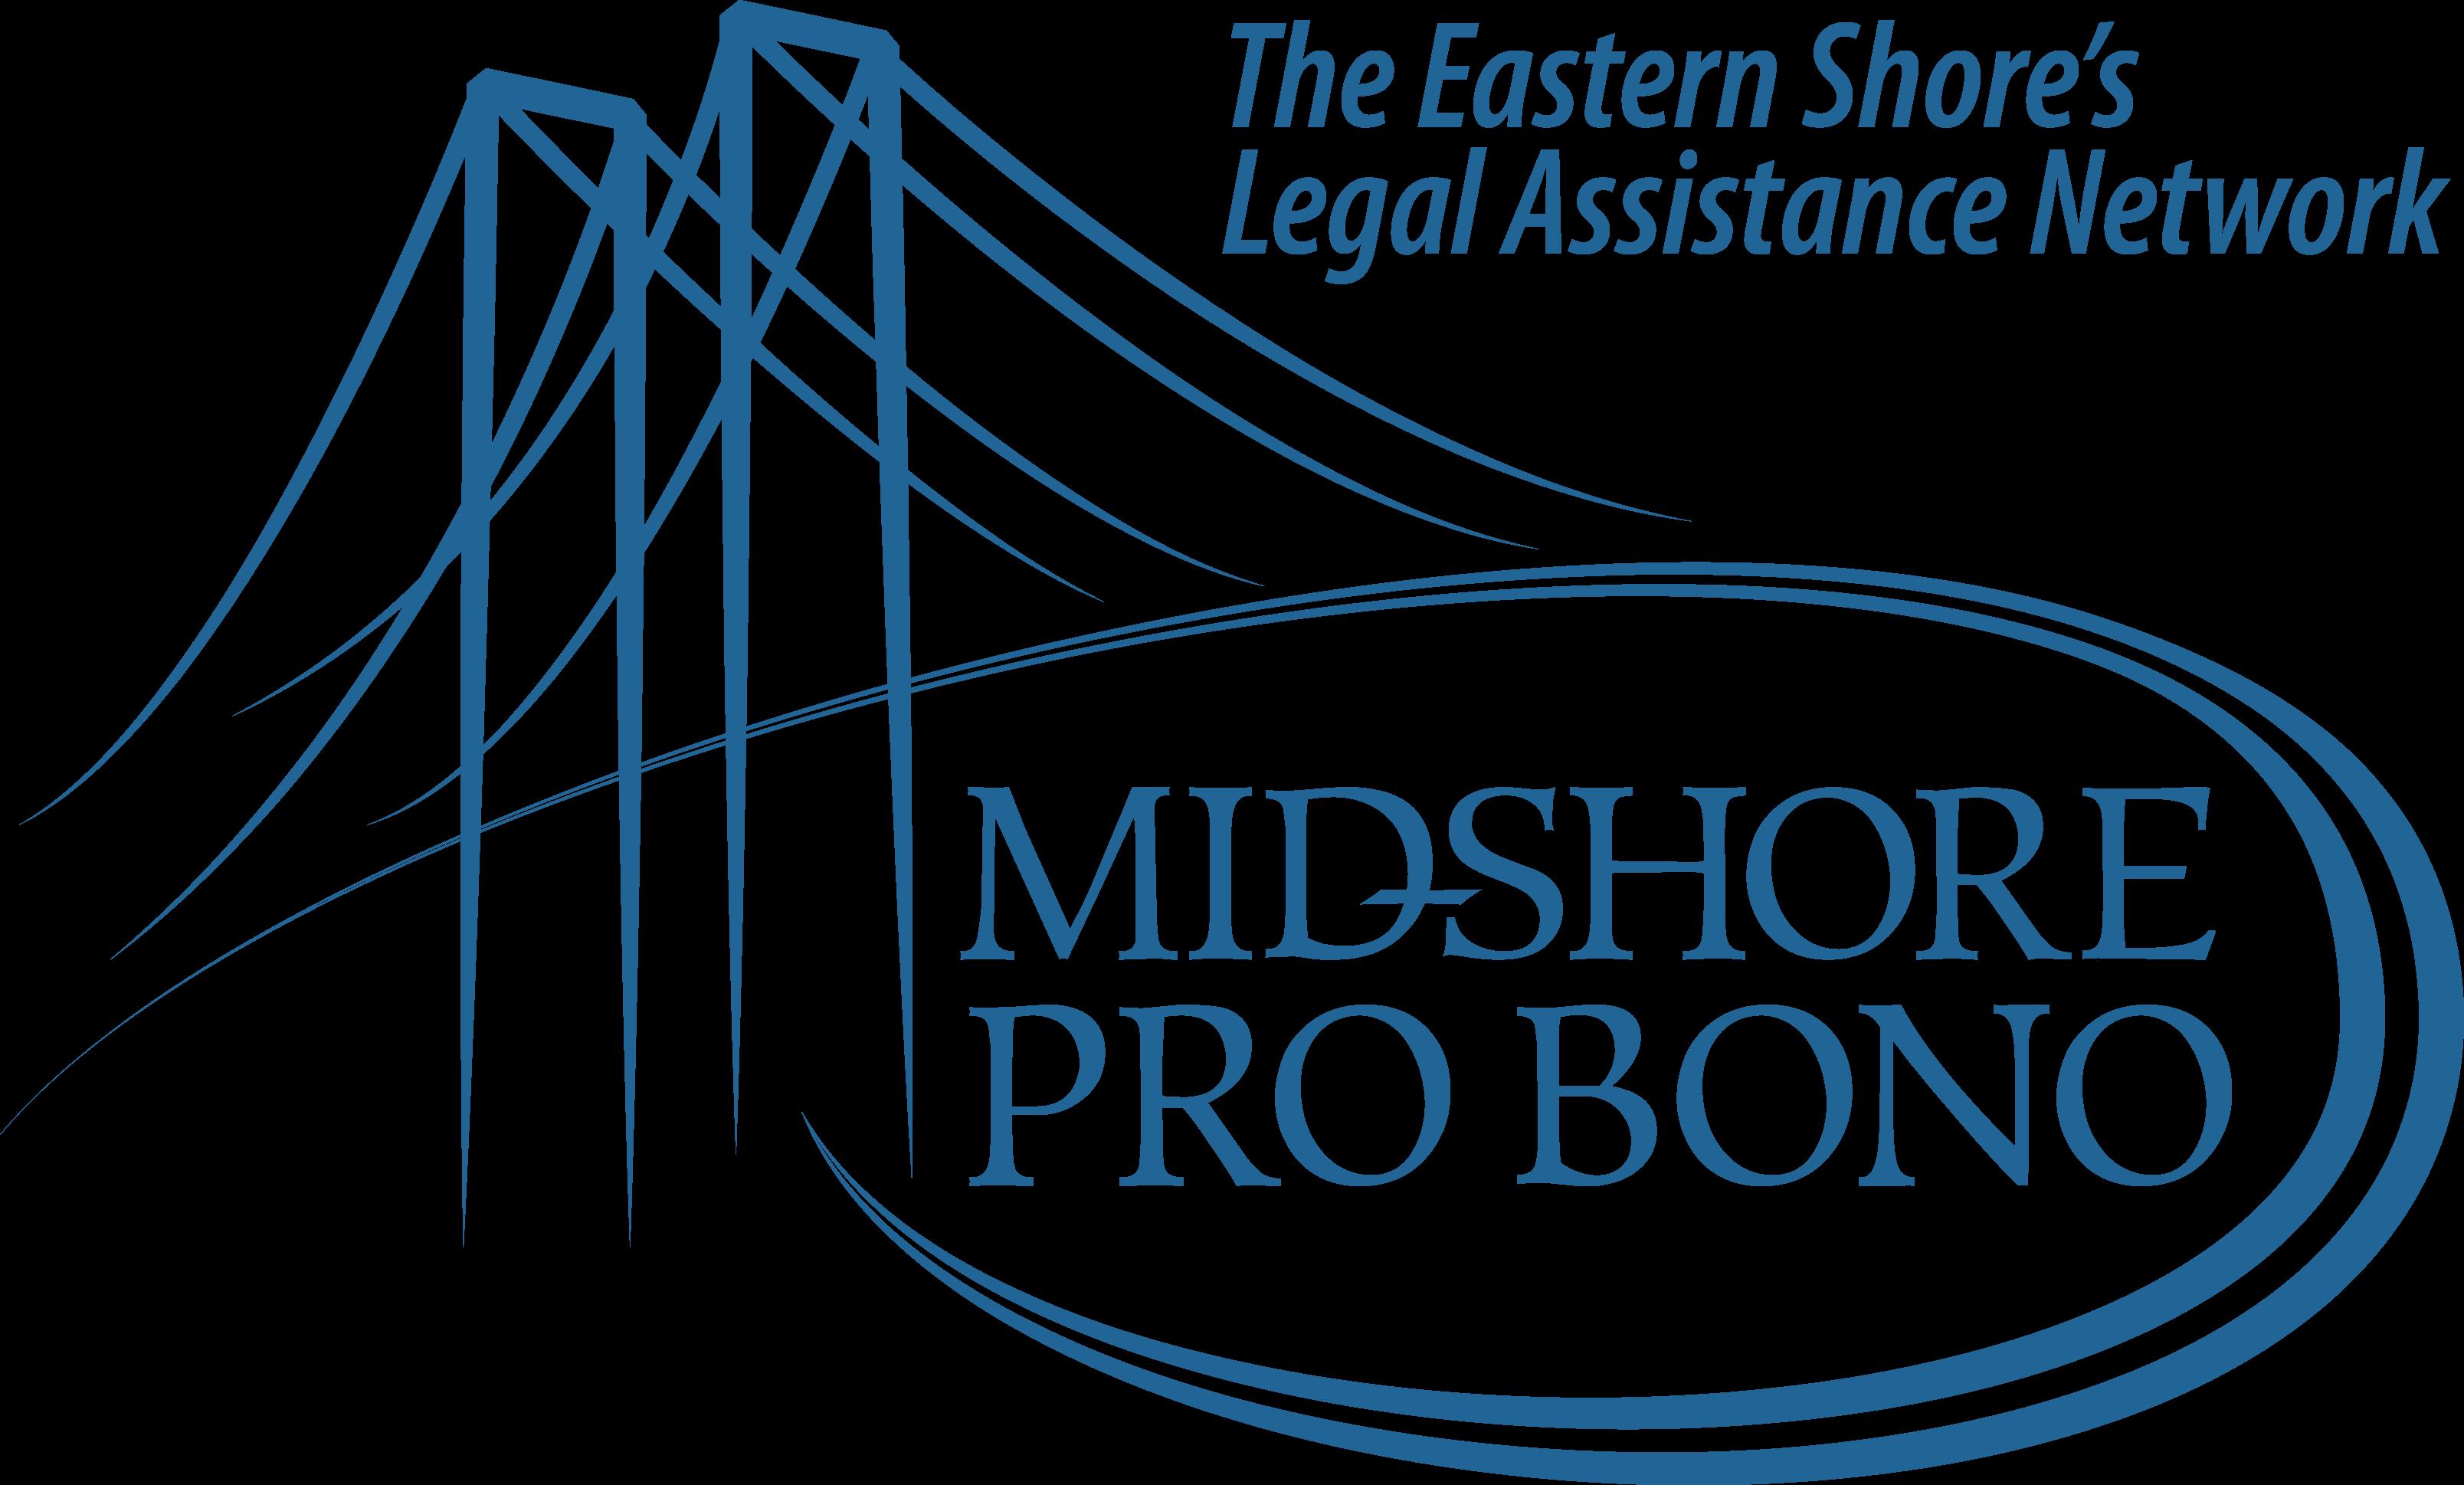 Mid Shore Pro Bono Logo